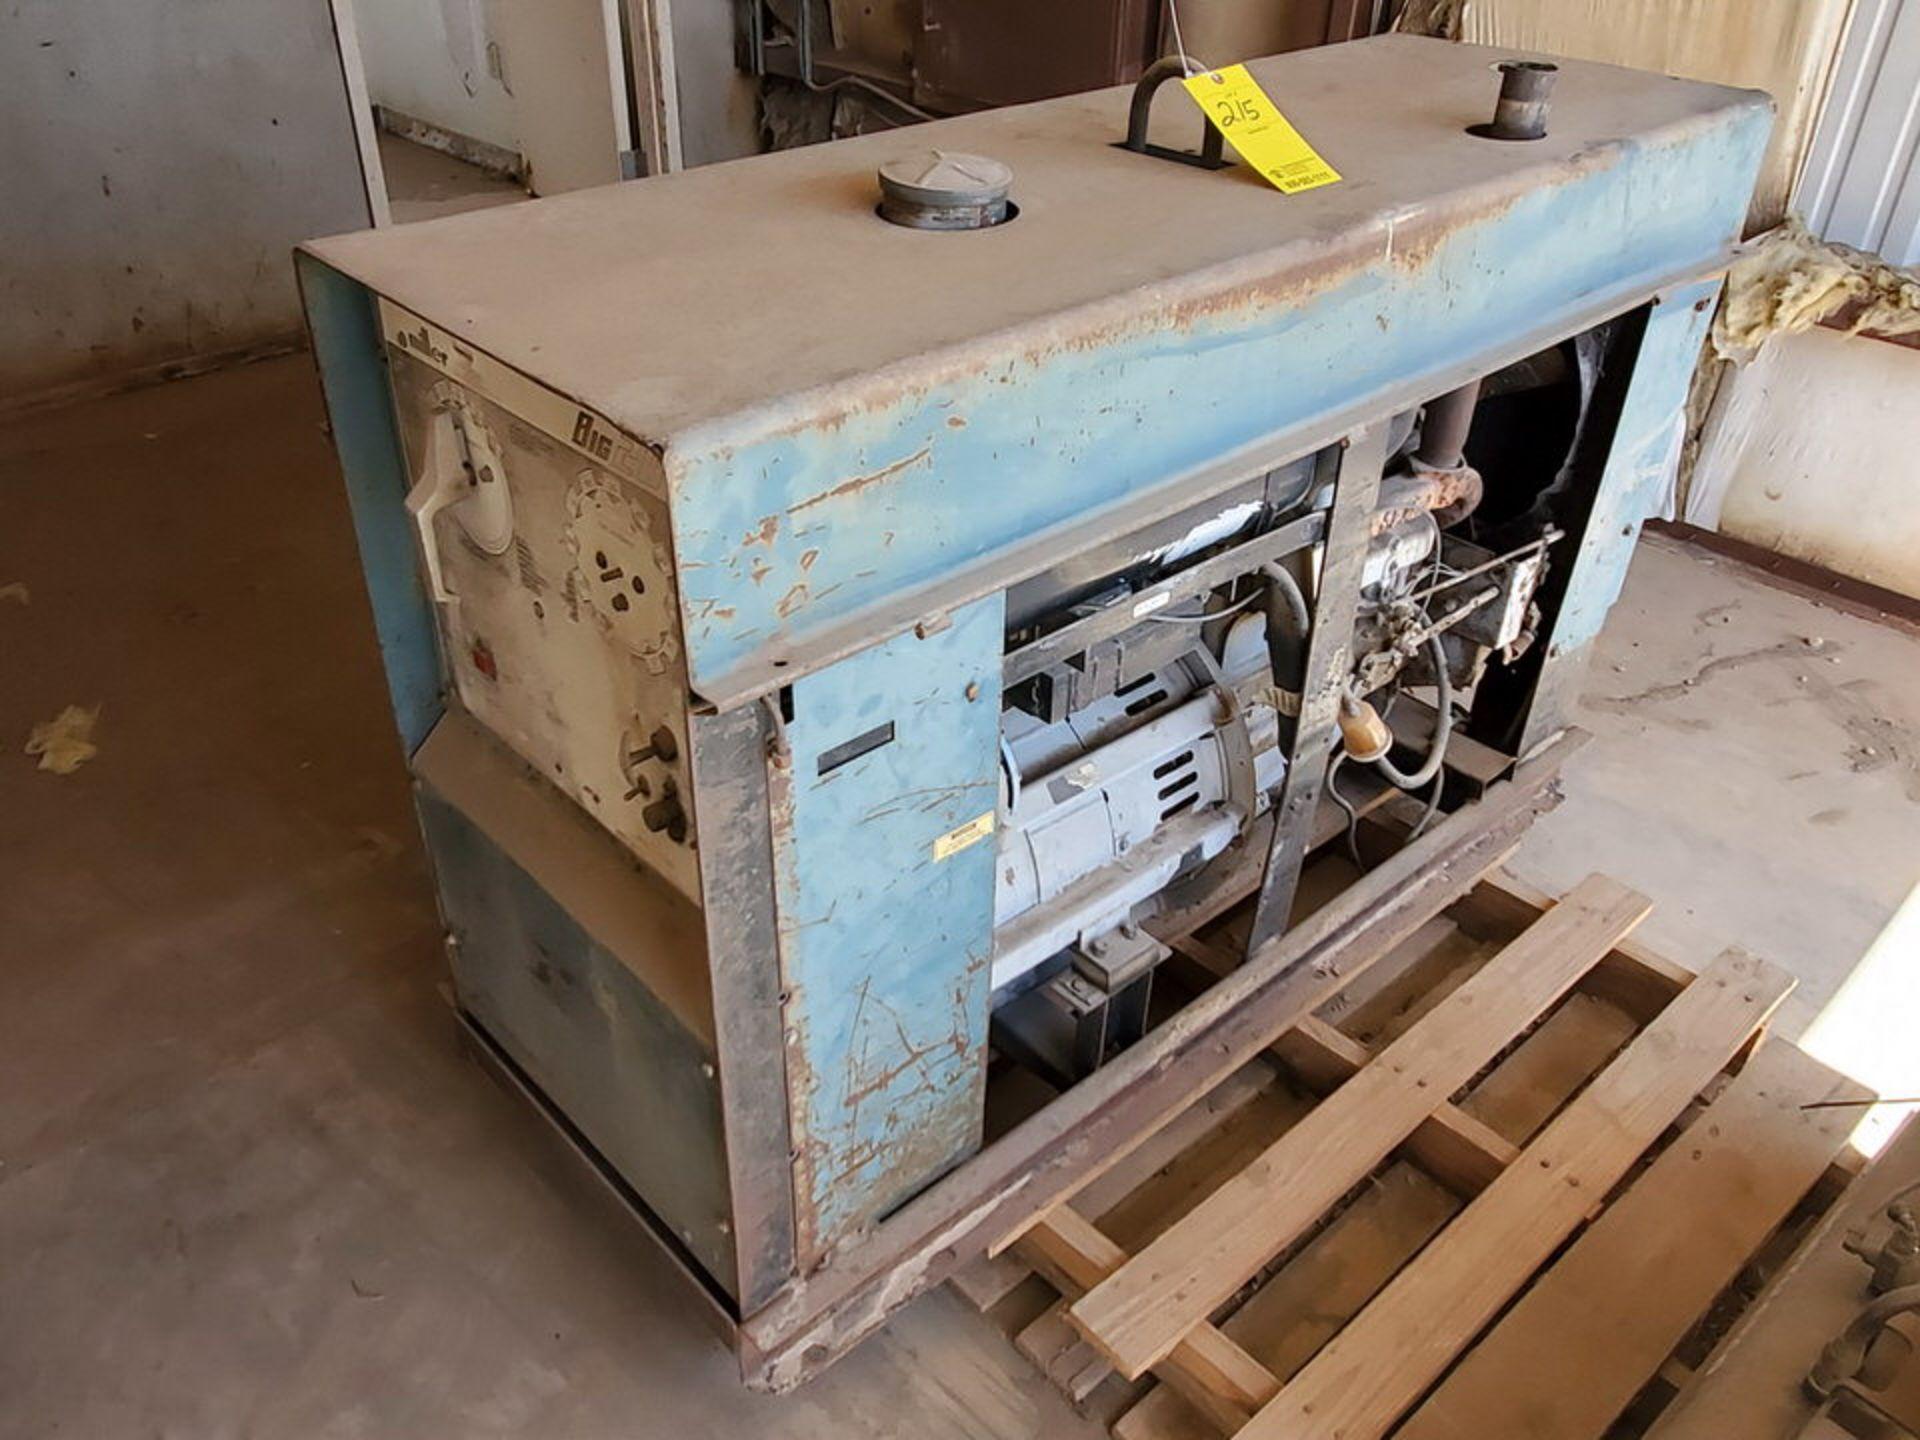 Miller Big 20 Welder Generator CC/DC: 20-750A, CC/AC: 20-575A - Image 5 of 8